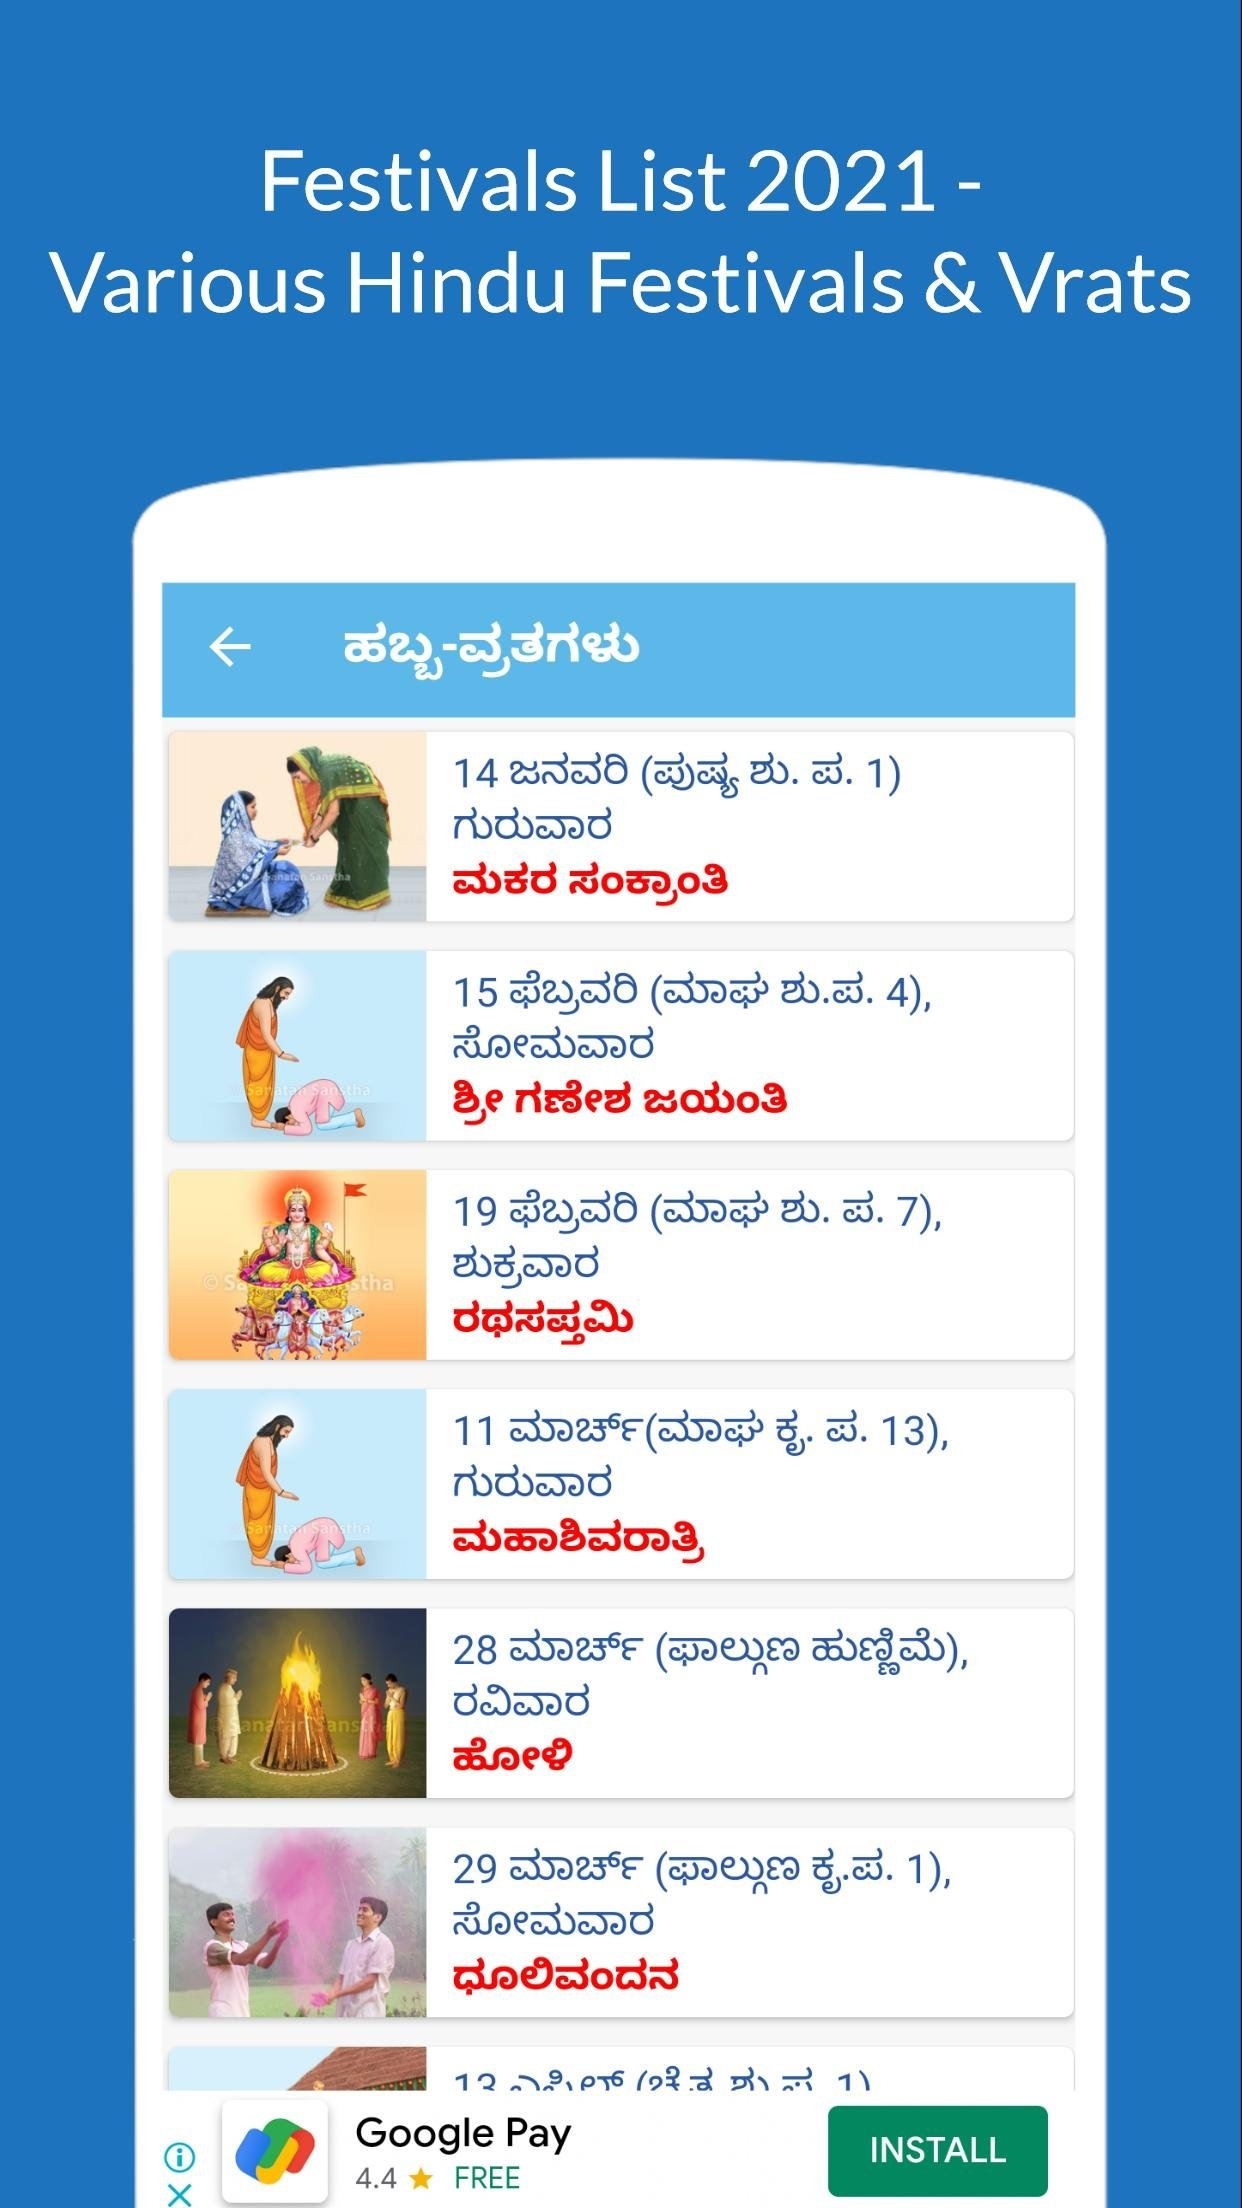 Kannada Calendar 2021 (Sanatan Panchanga) For Android - Apk Download throughout Calendar 2021 In Kannada